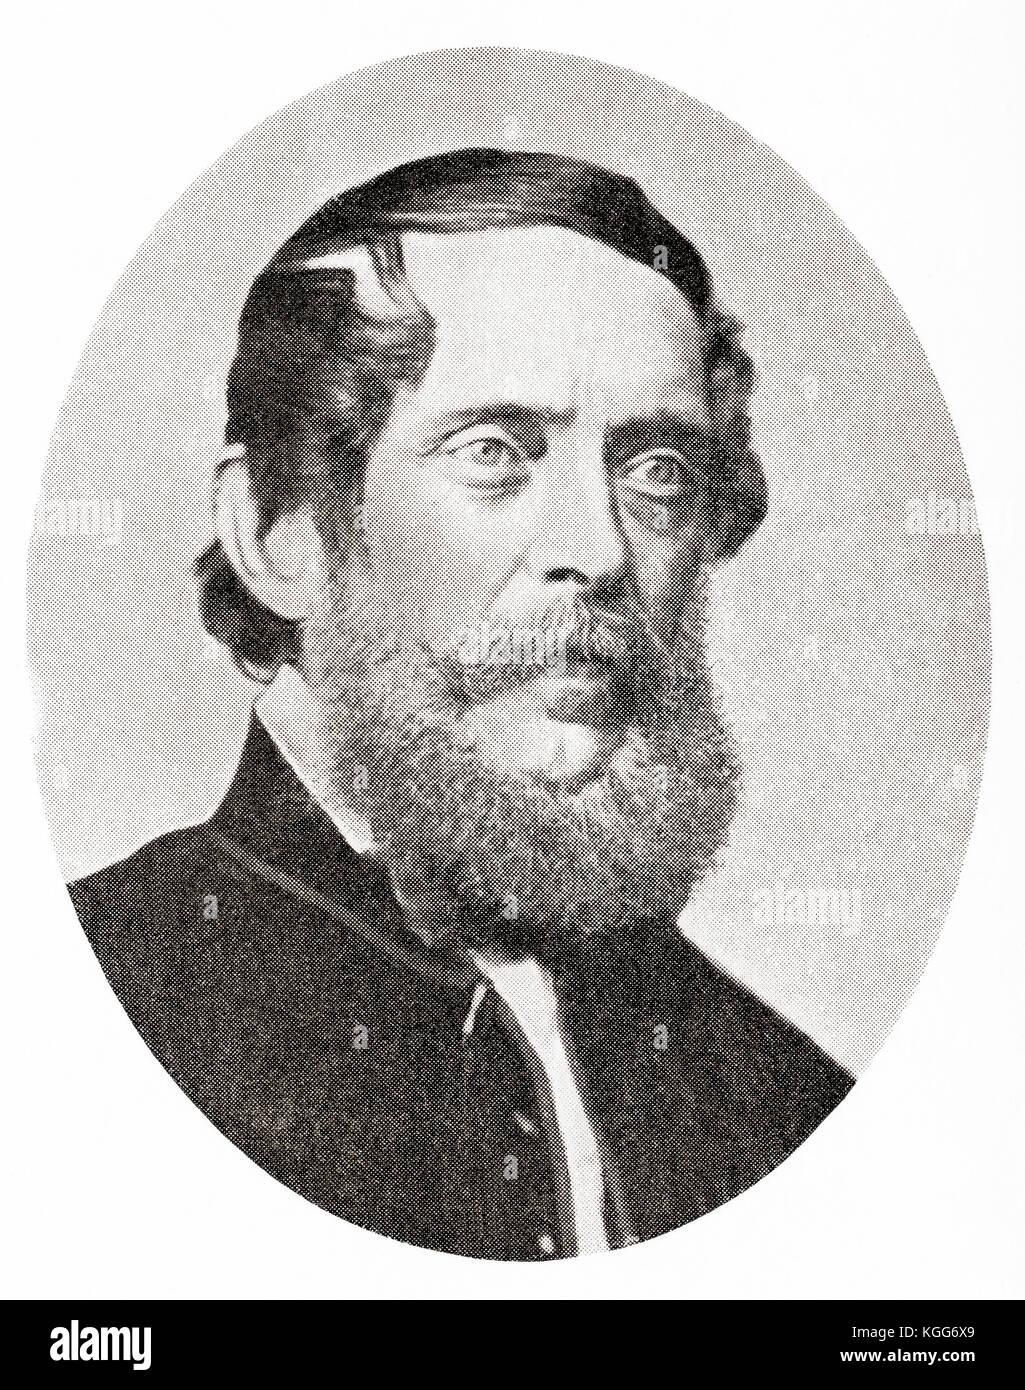 Lajos Kossuth de Udvard et Kossuthfalva aka Louis Kossuth, 1802 –  1894.  Hungarian lawyer, journalist, politician, Stock Photo